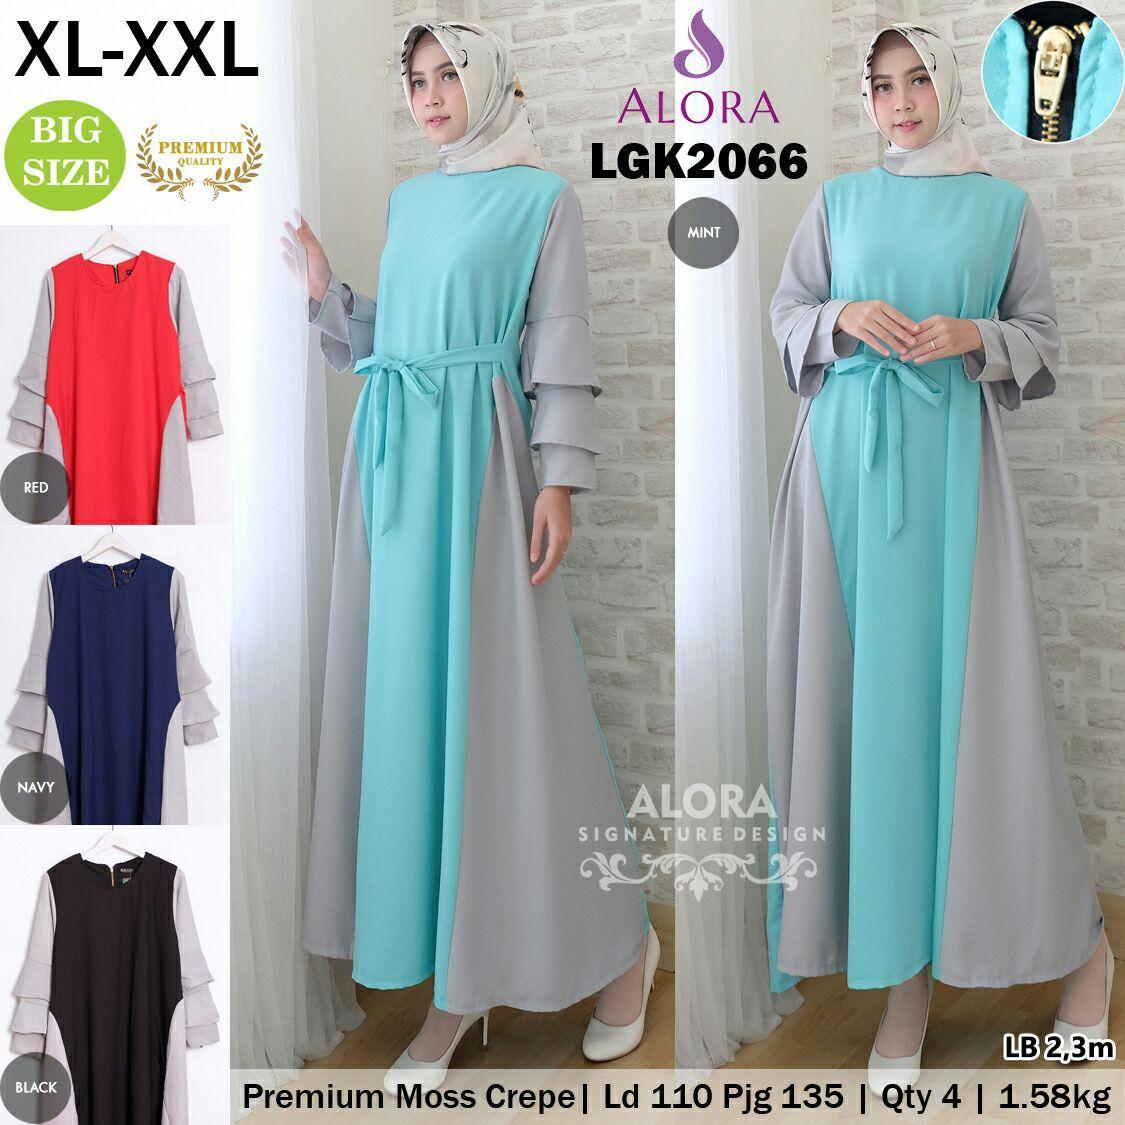 RATU SHOPPING Gamis jumbo size XL XXL Spesial lebaran baju muslim idul fitri ramadhan ceria LGK2066